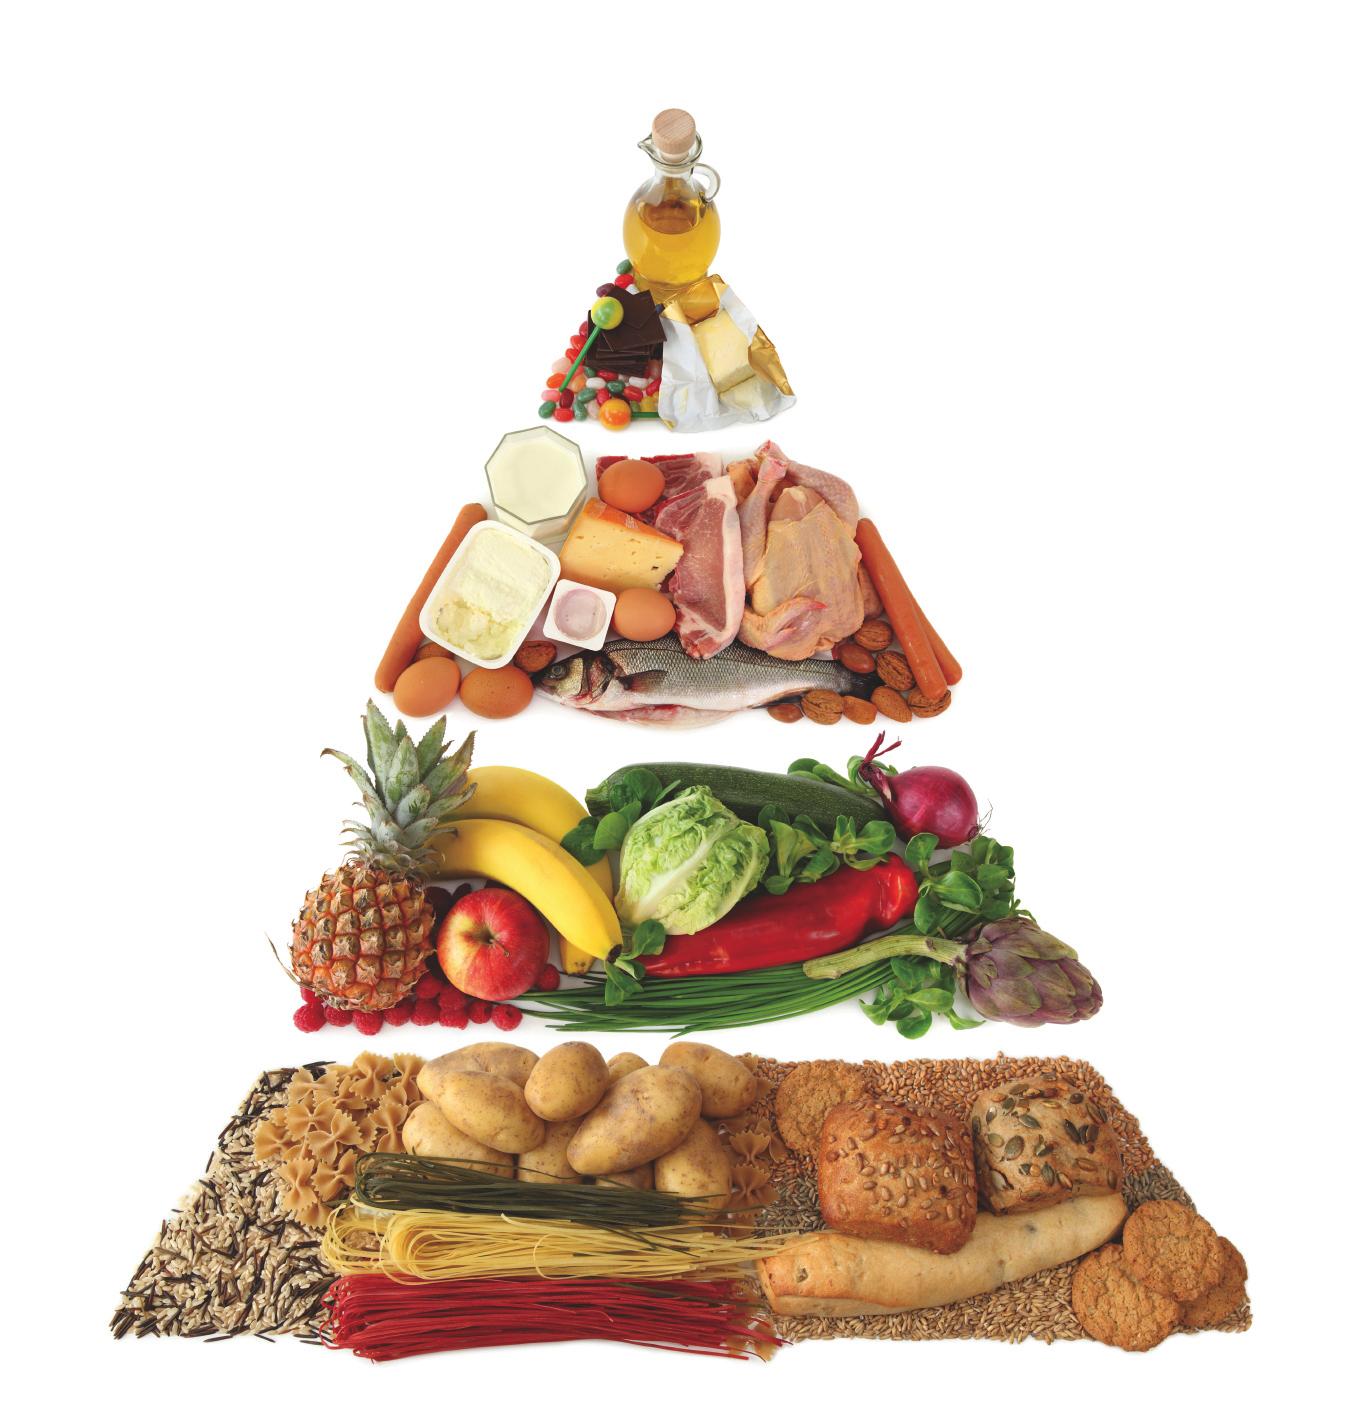 balanced food for healthy life essay